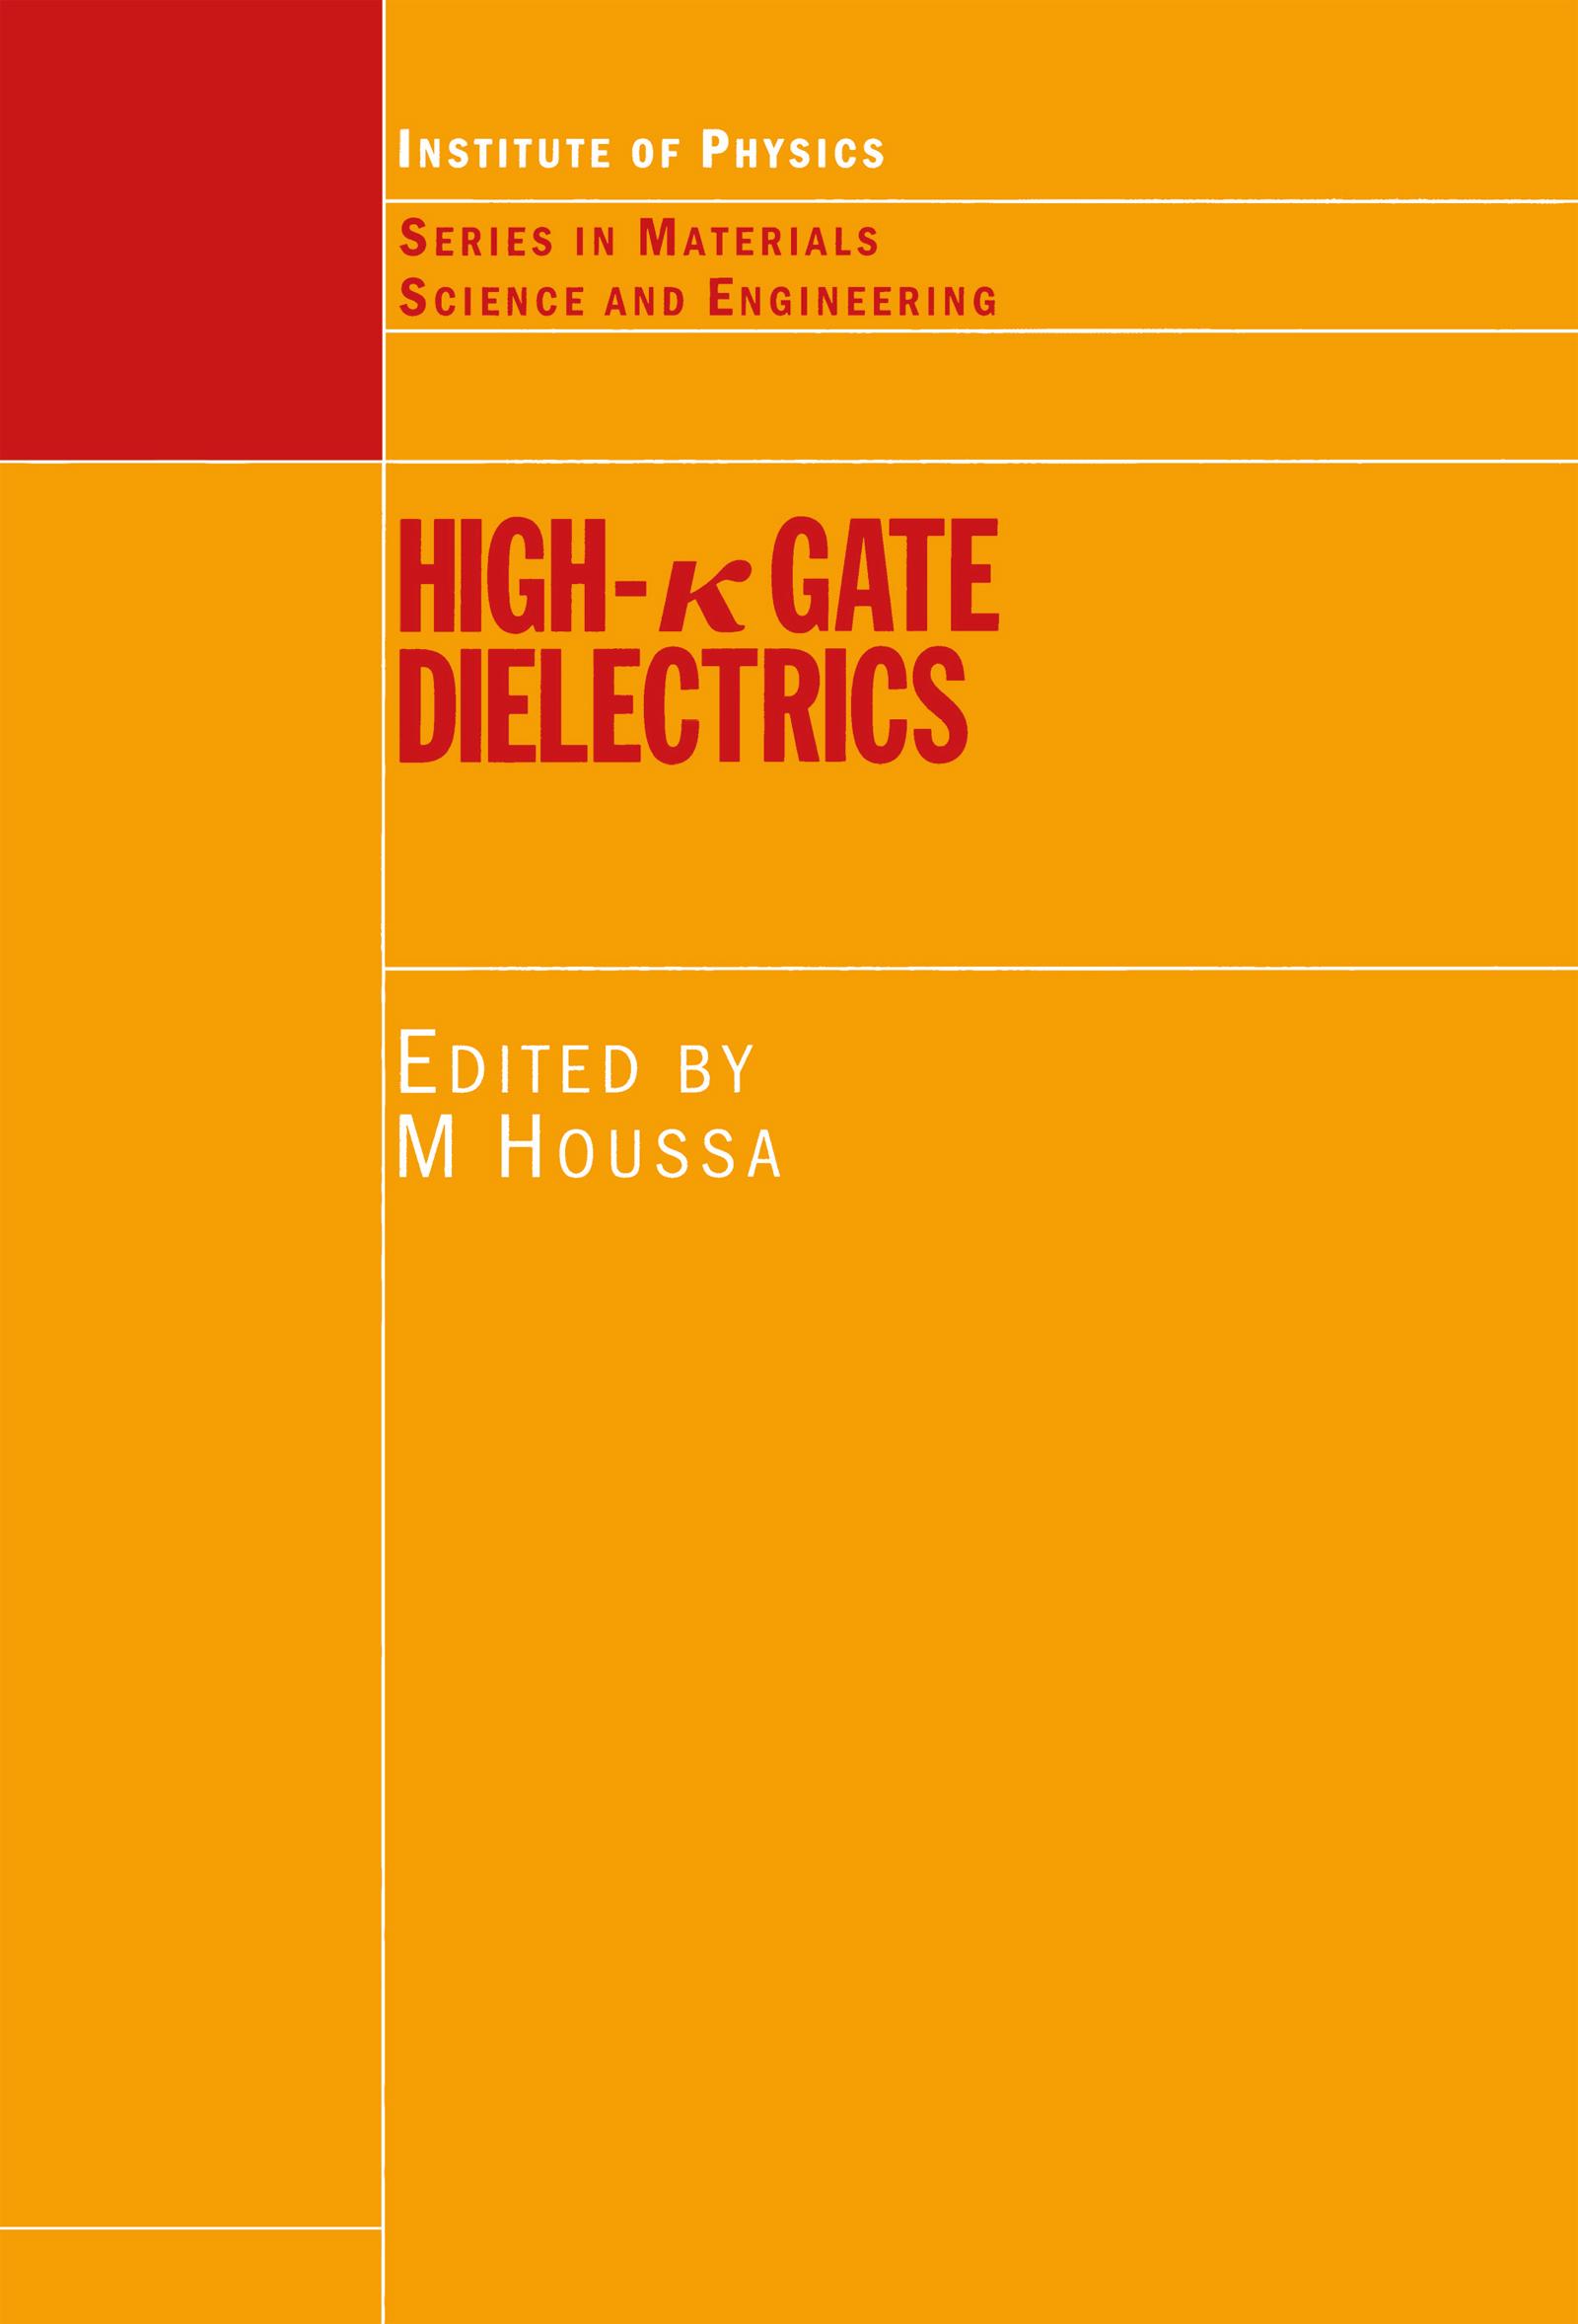 High-κ Gate Dielectrics